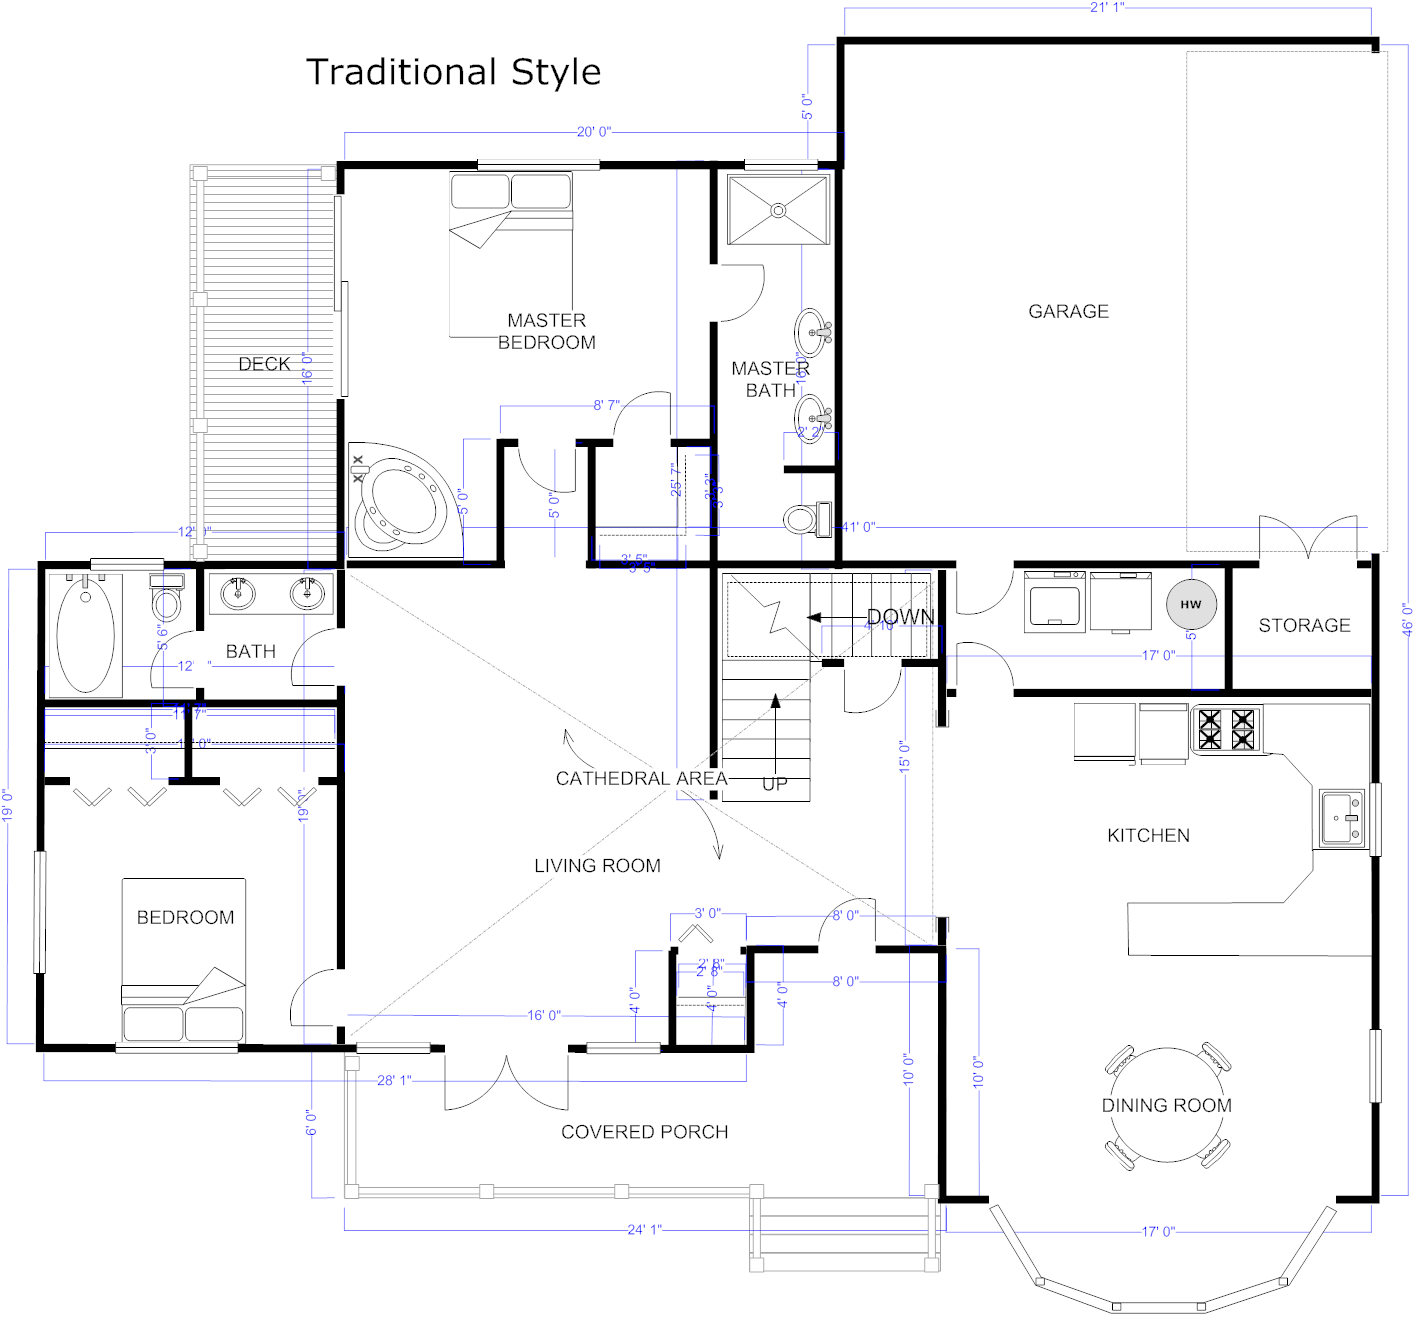 Architecture Software App House Plans 152001